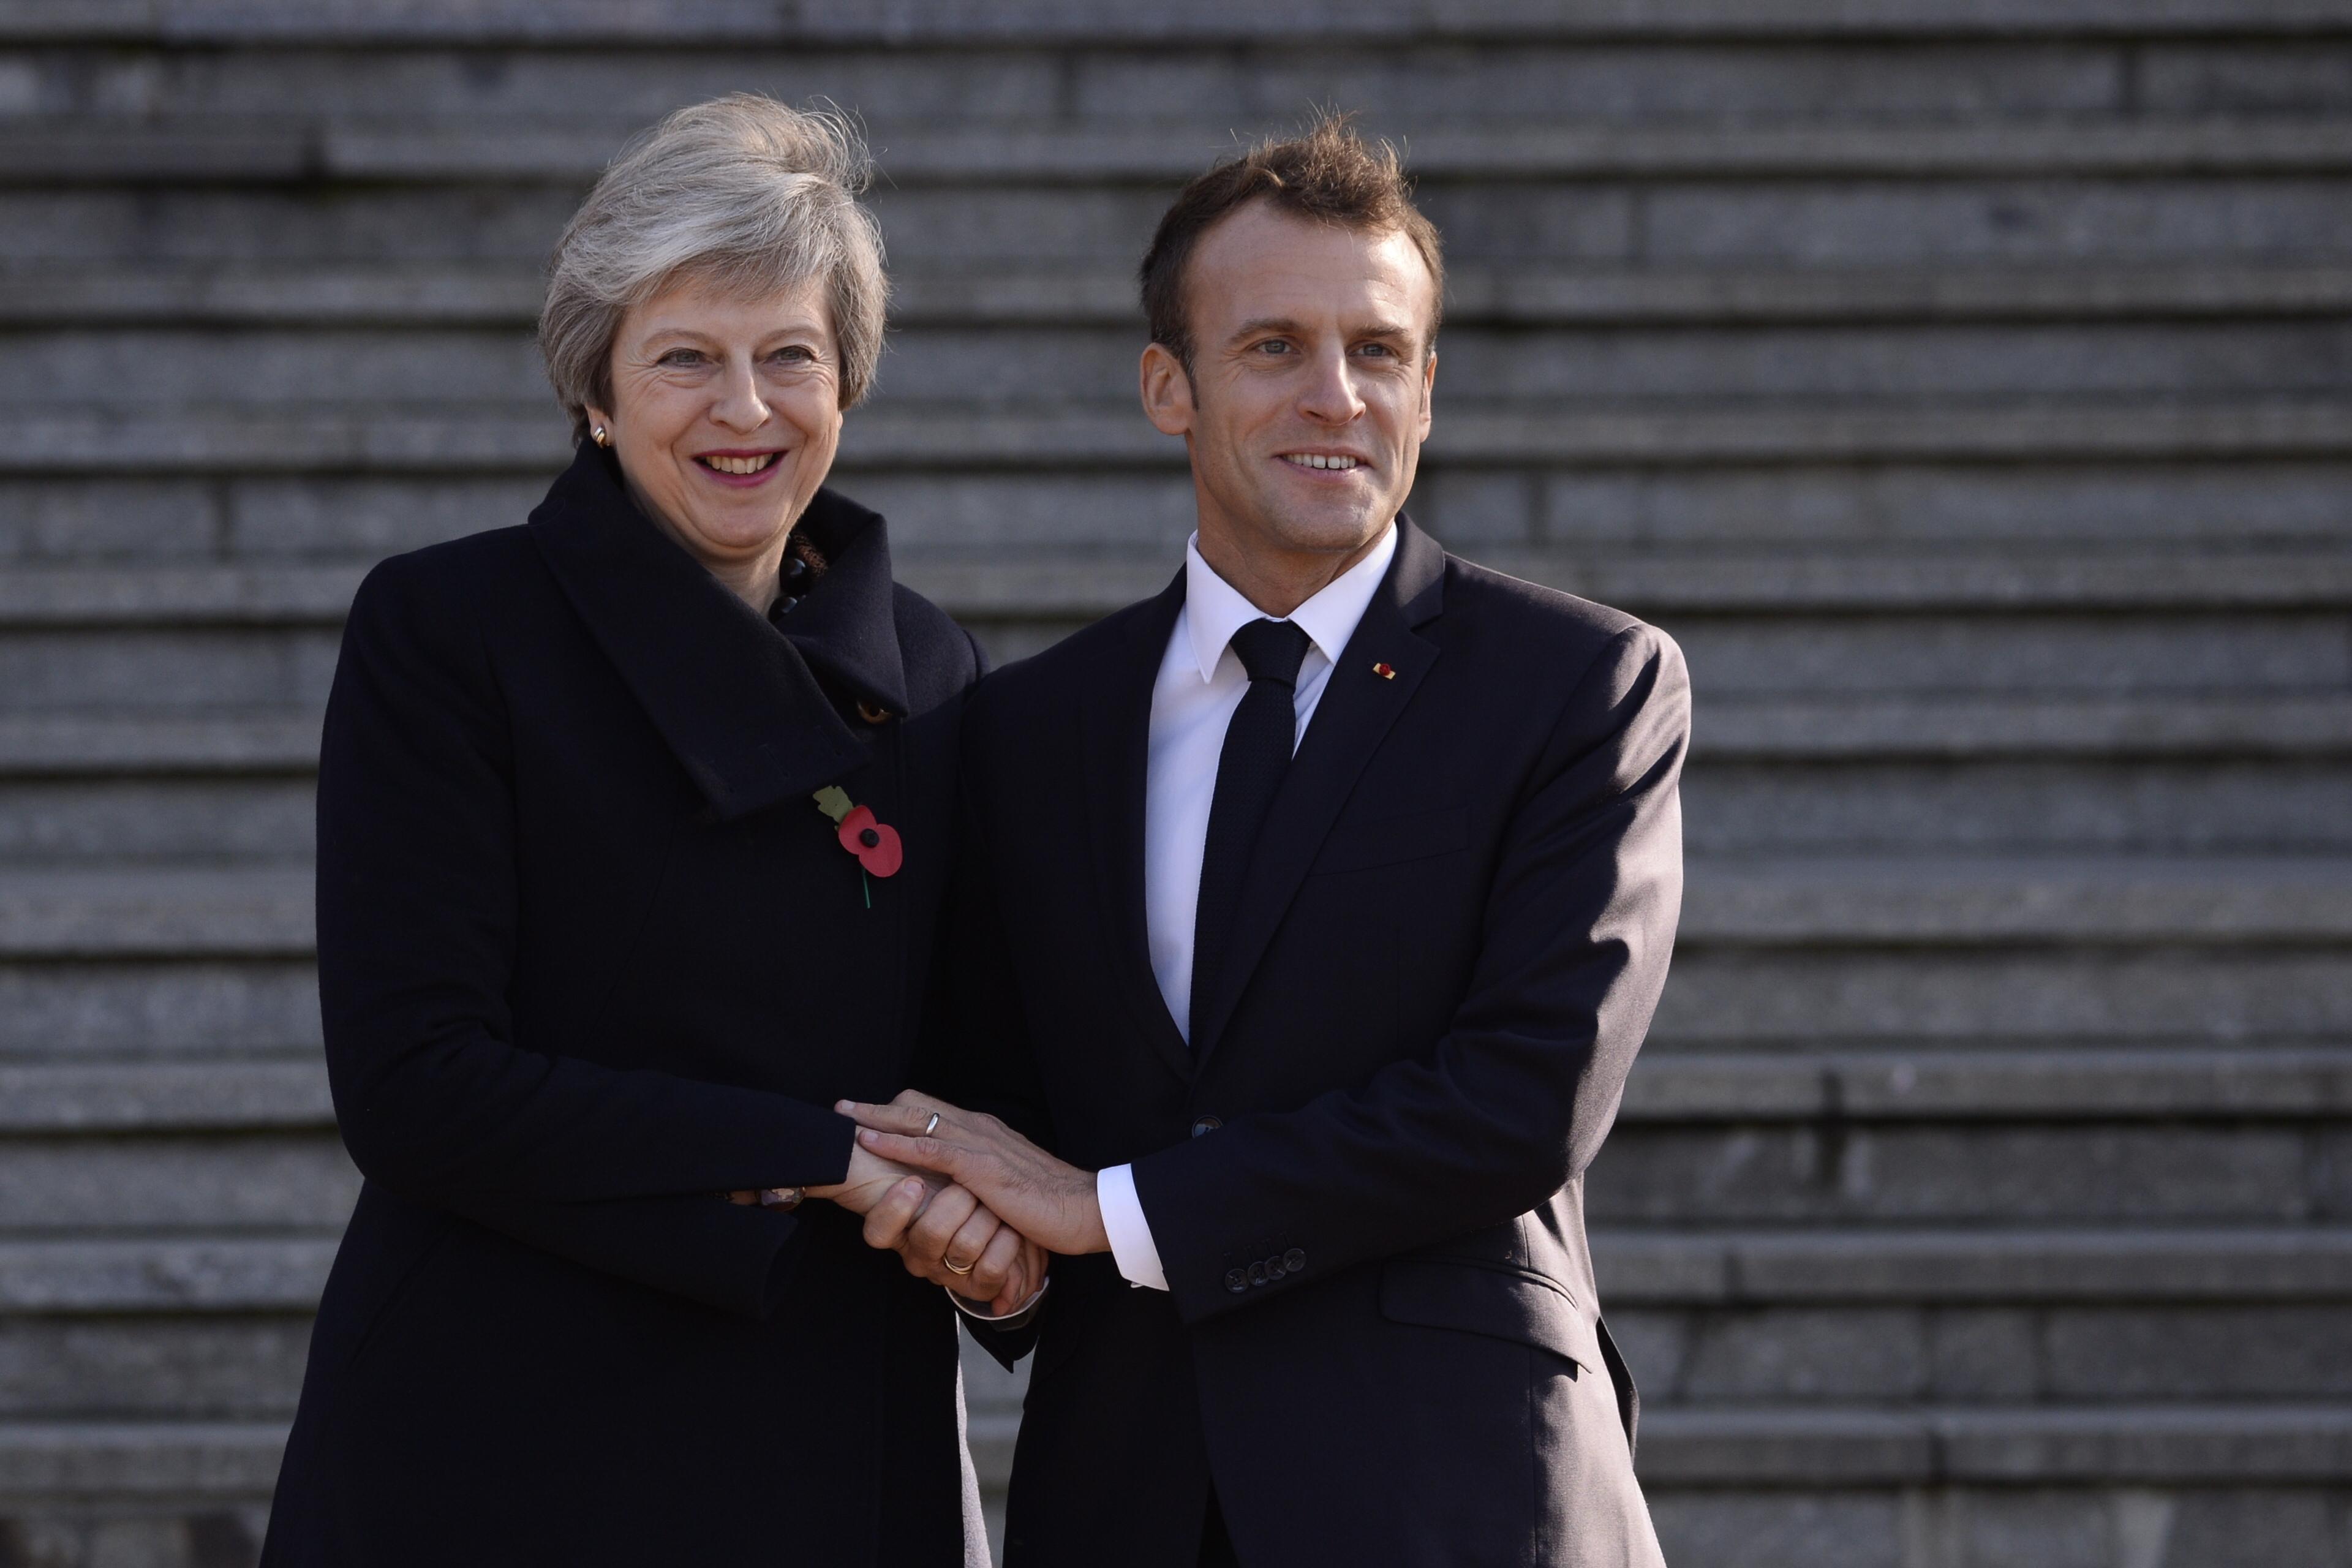 Theresa May meets with French President Emmanuel Macron. Credit: PA